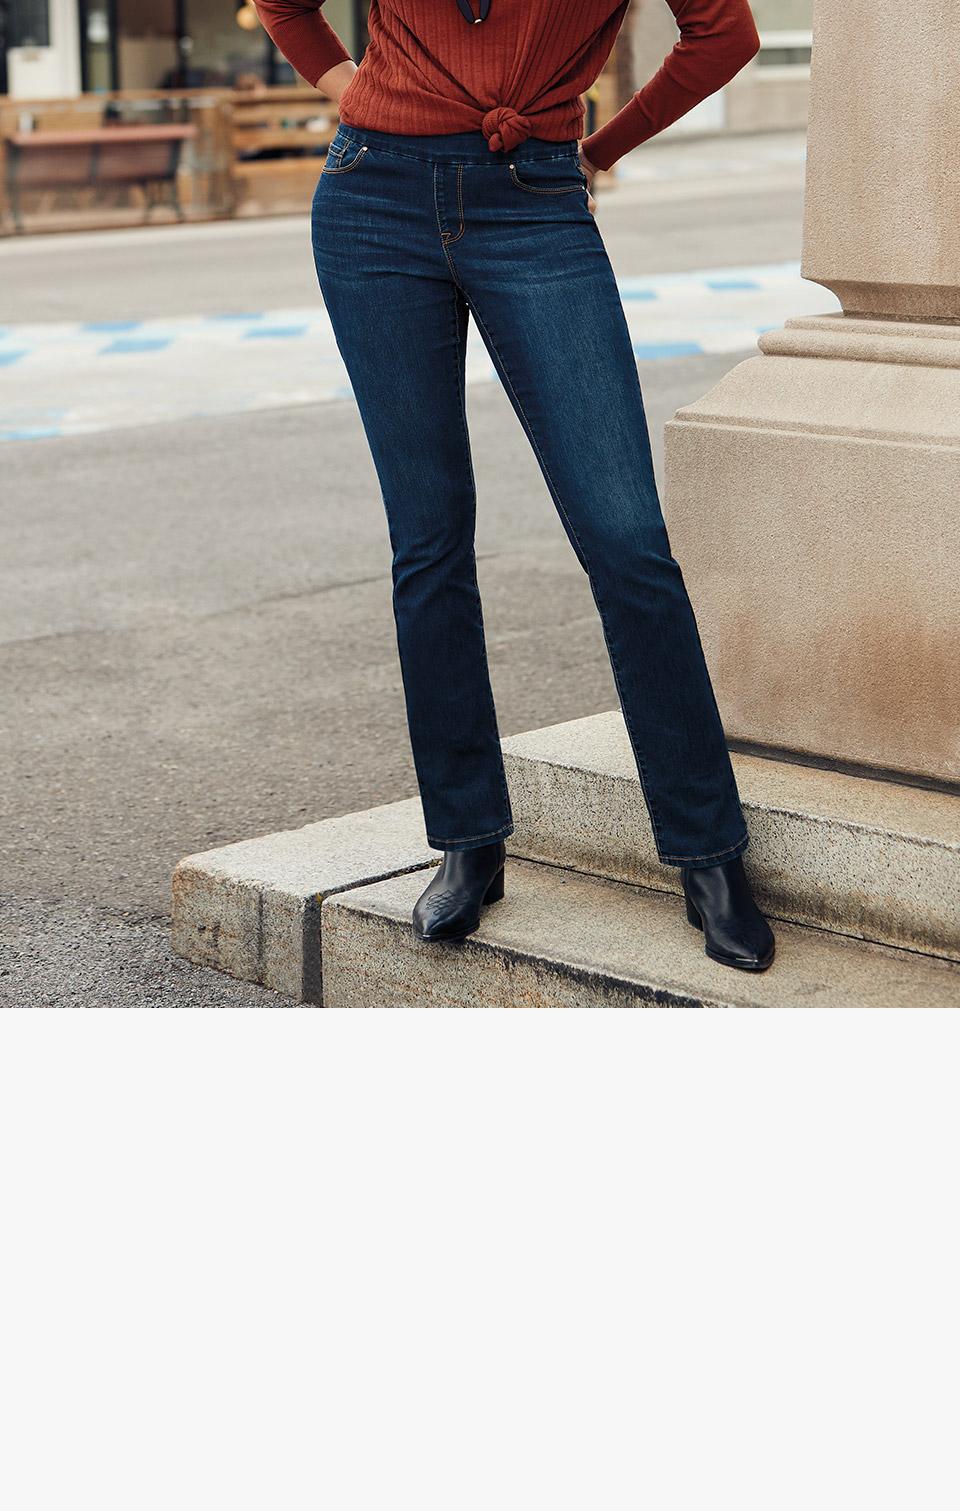 versatile jeans at Reitmanss